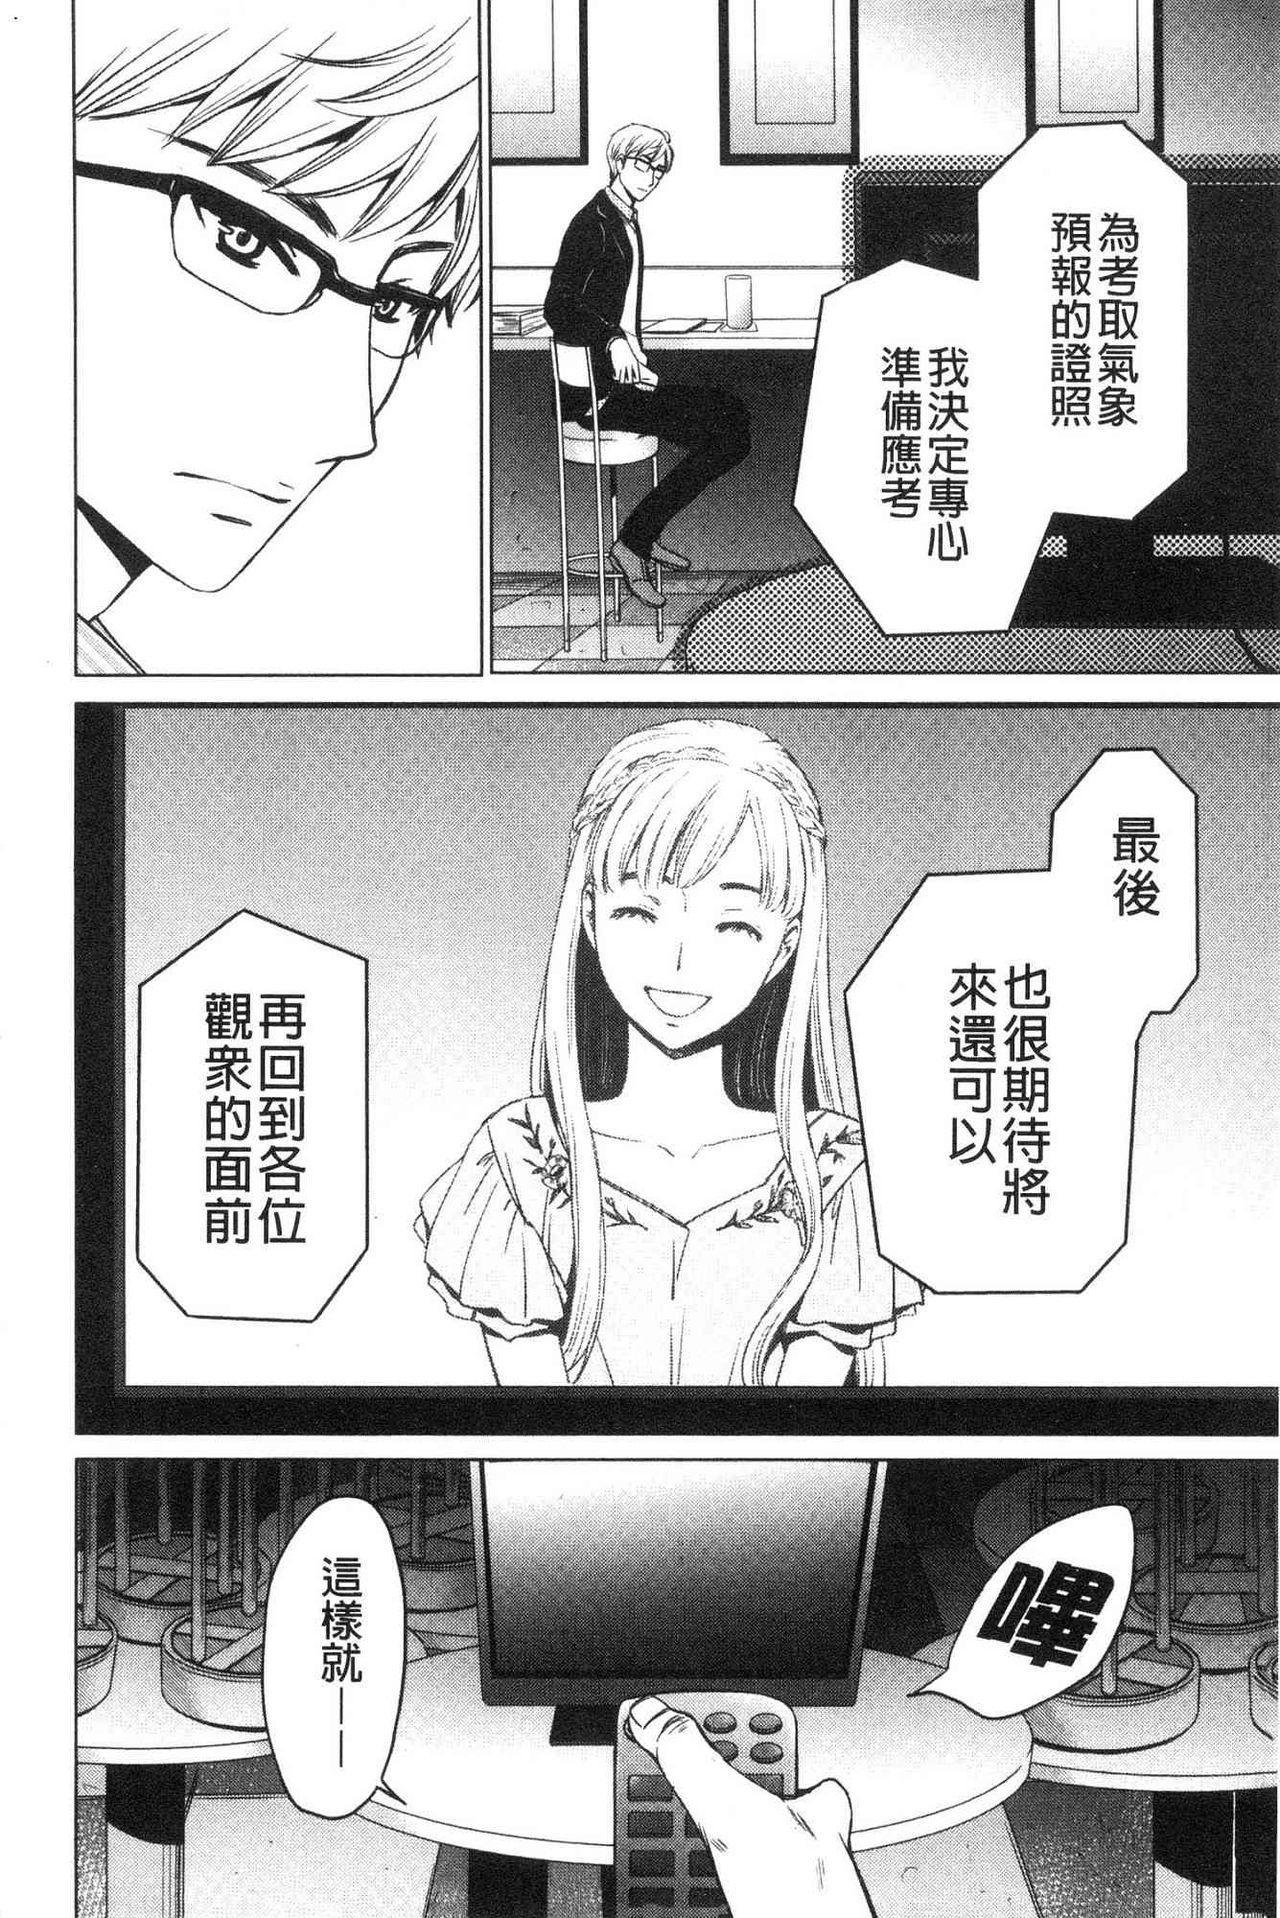 [Gotoh Akira]  21-ji no Onna ~Camera no Mae no Mesuinu~ 2 | 21時之女 ~鏡頭前的牝犬~ 2 [Chinese] 151